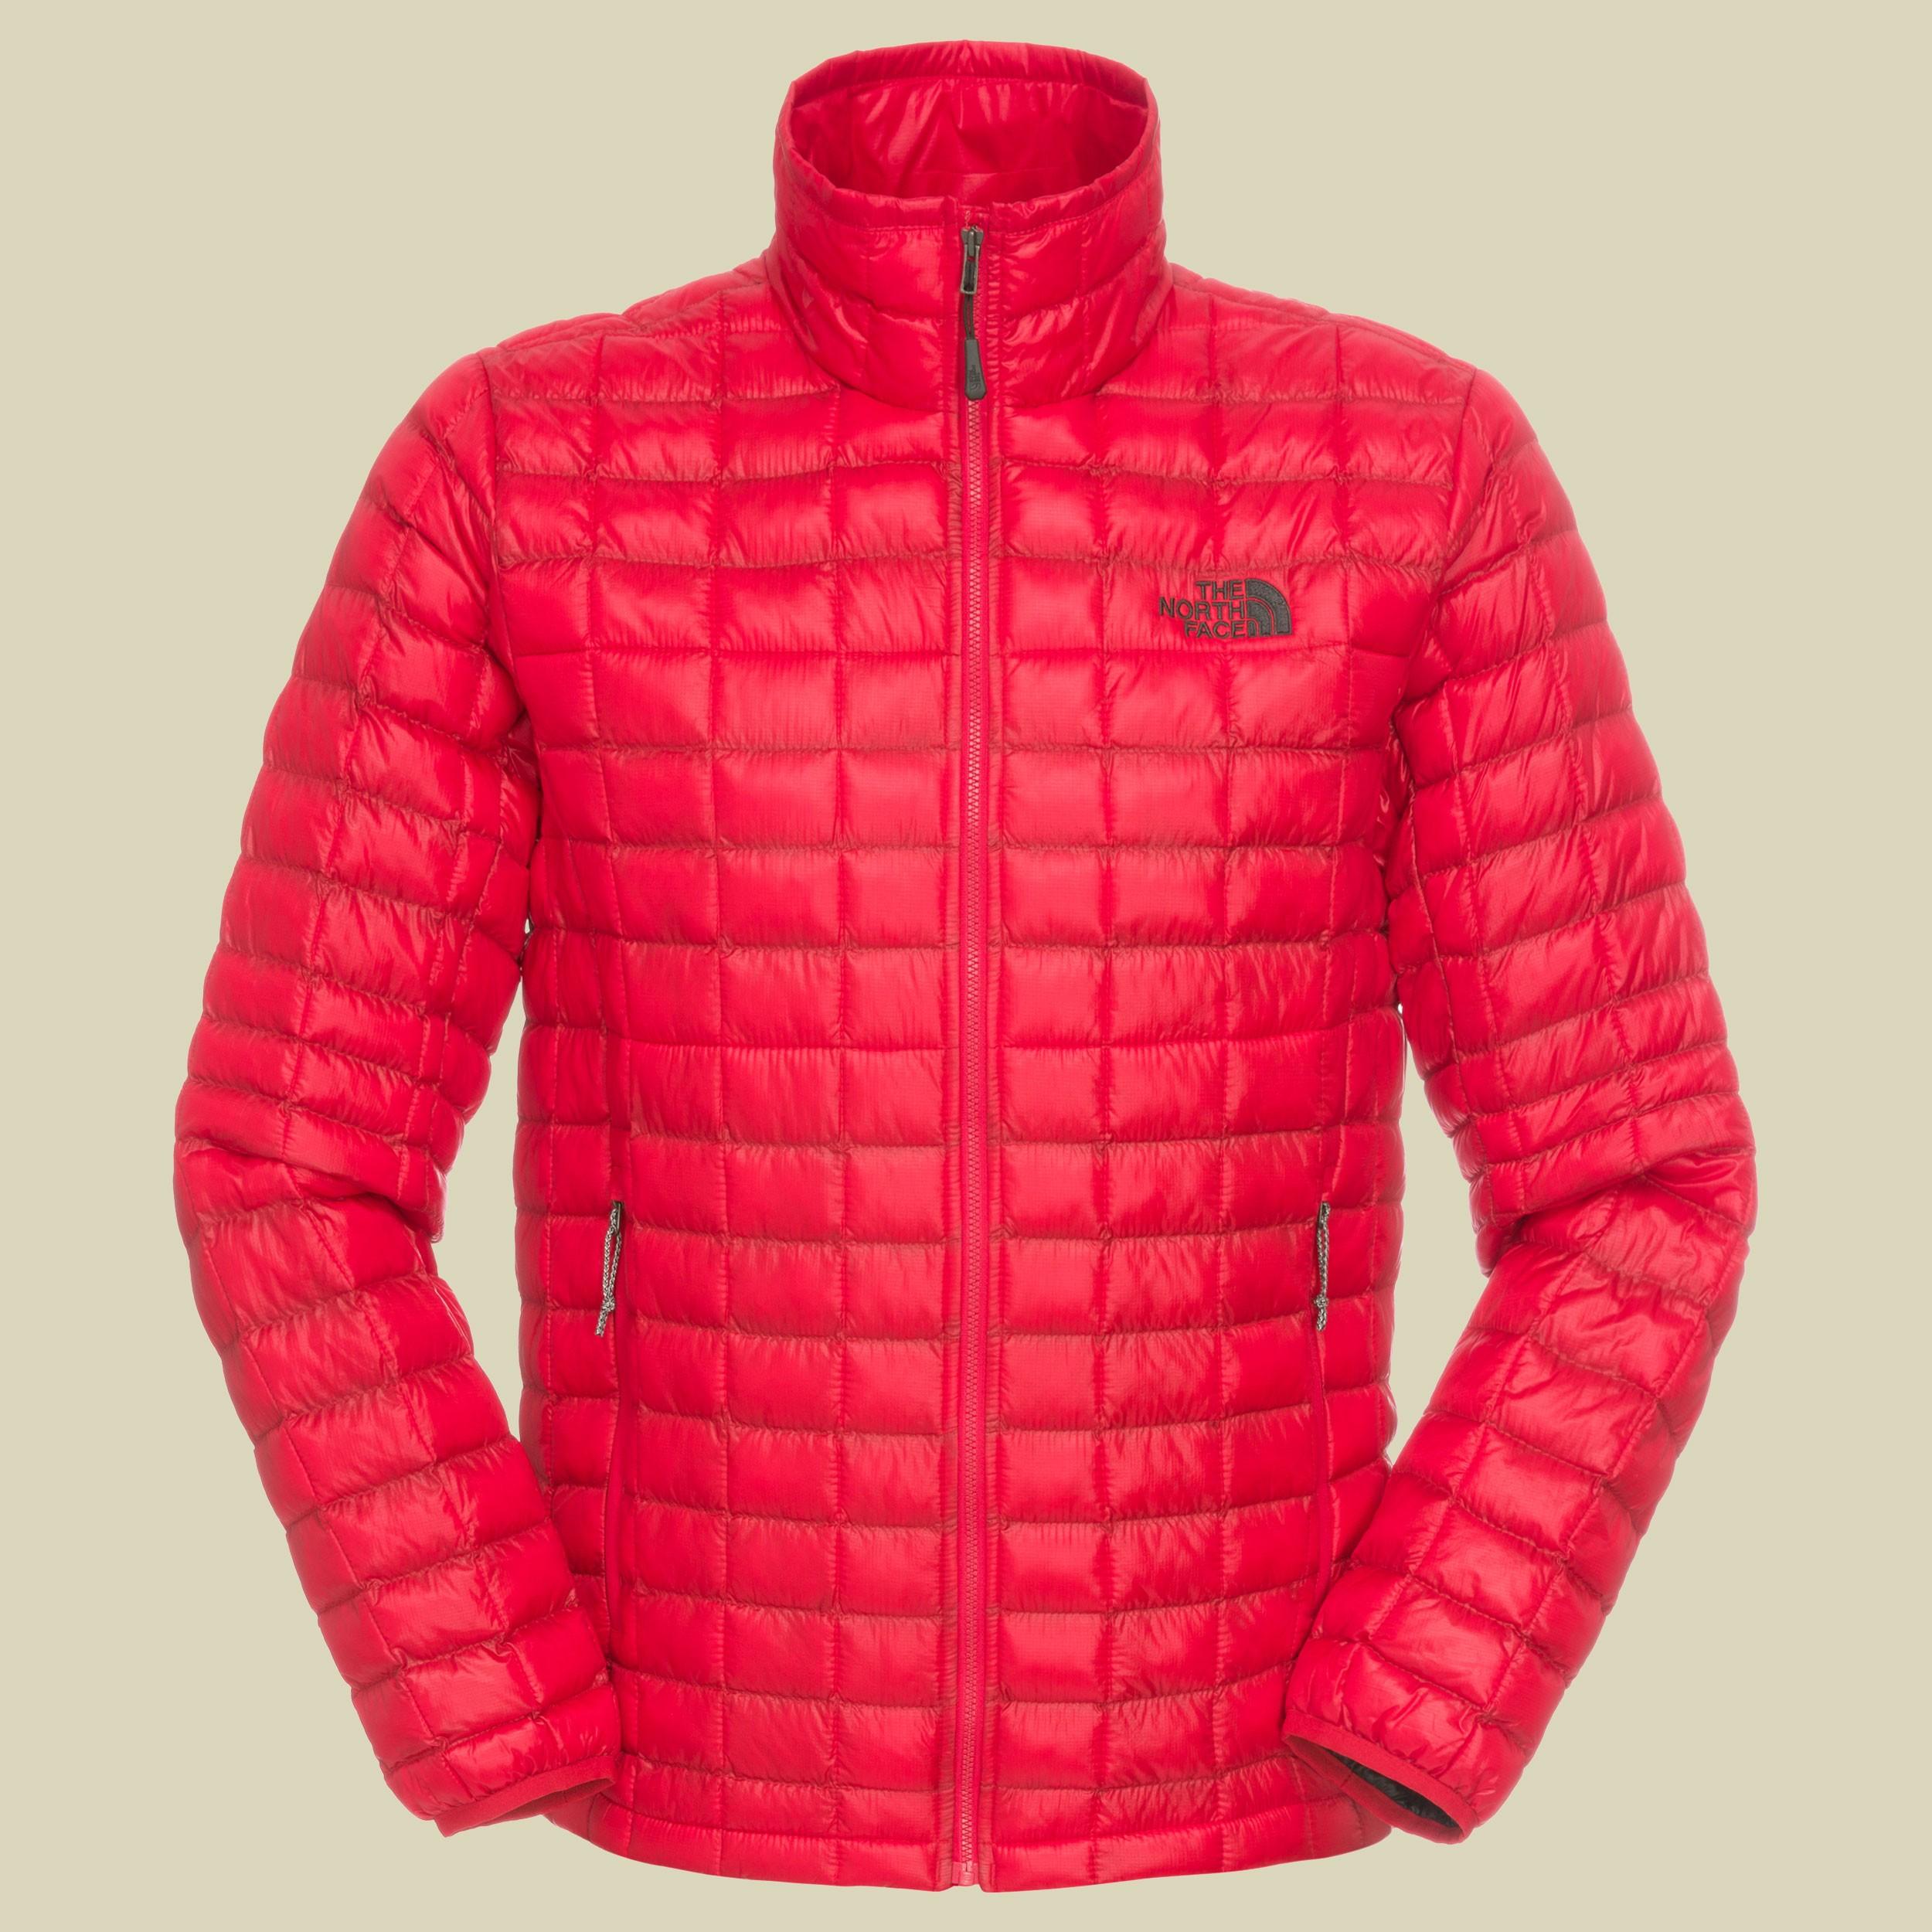 Thermoball Full Zip Jacket Men